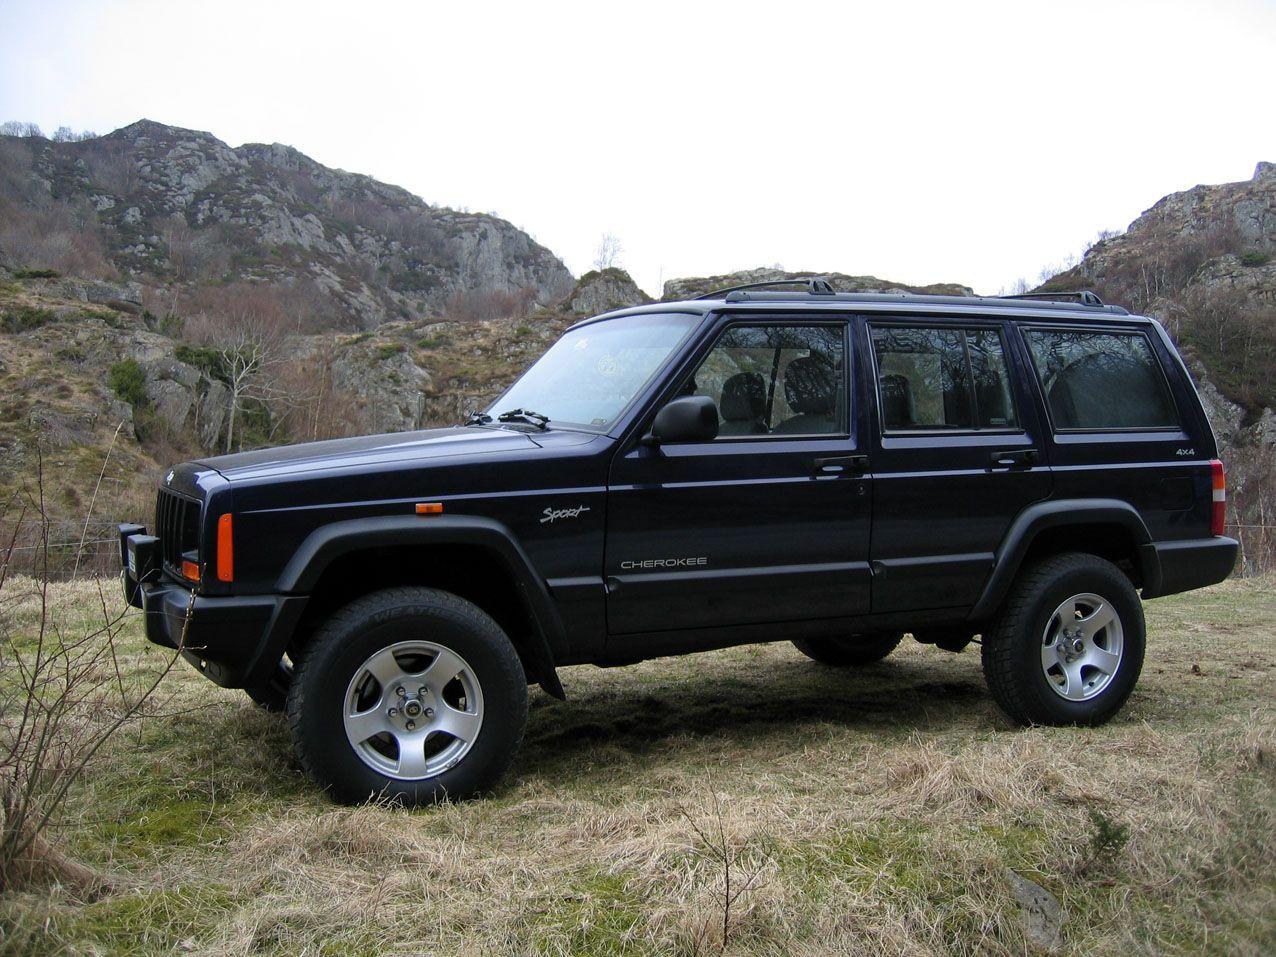 1998 jeep cherokee sport Jeep cherokee, Jeep cherokee